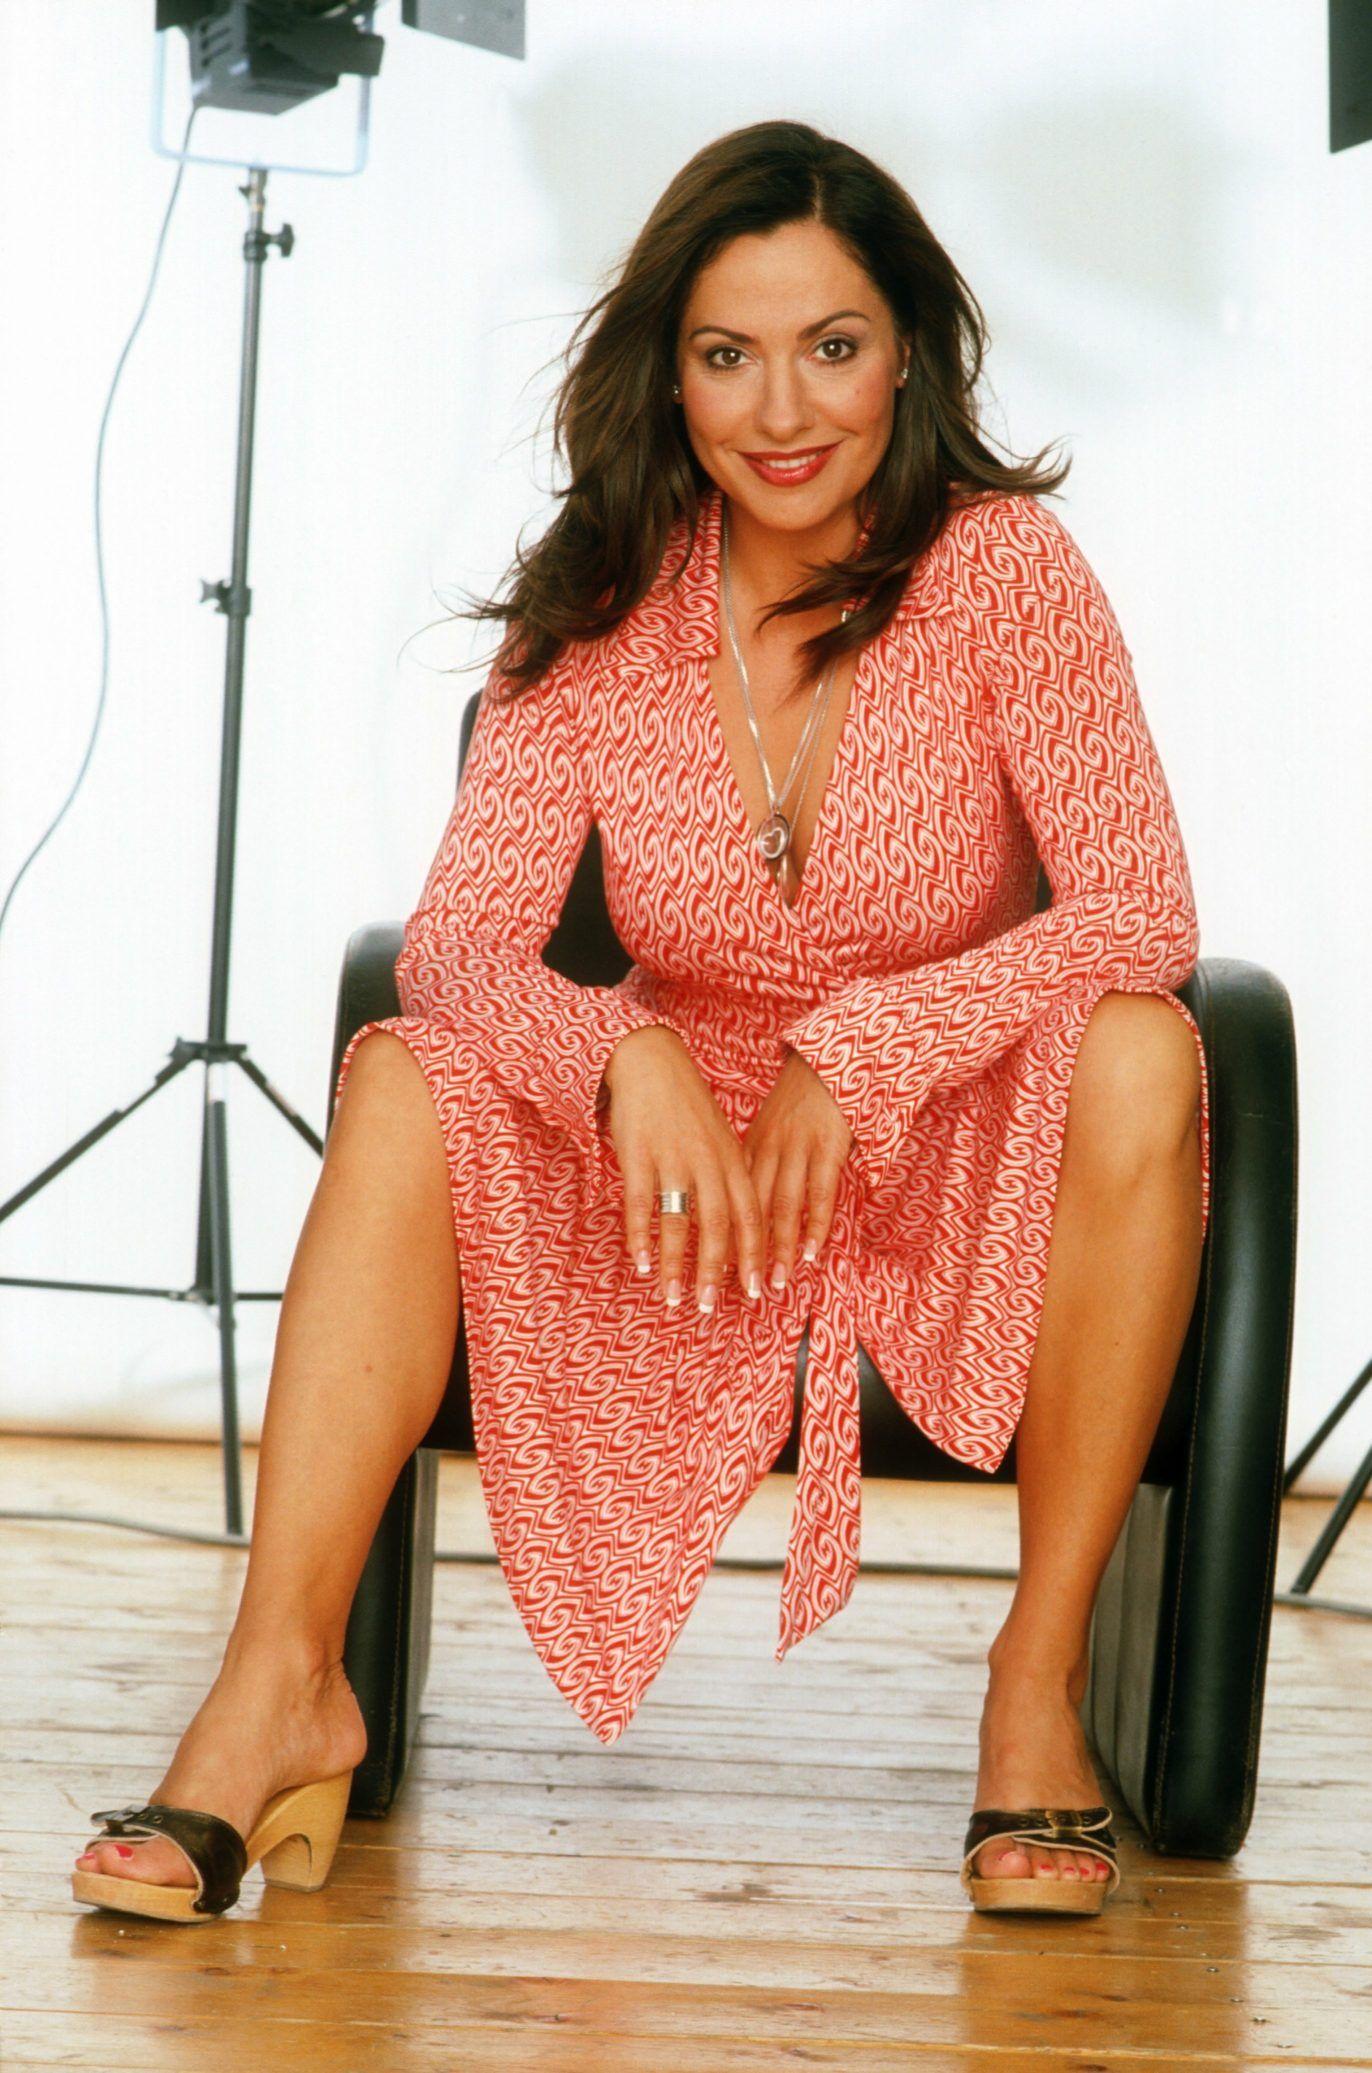 Simone Thomalla Hot | Hot Girl HD Wallpaper